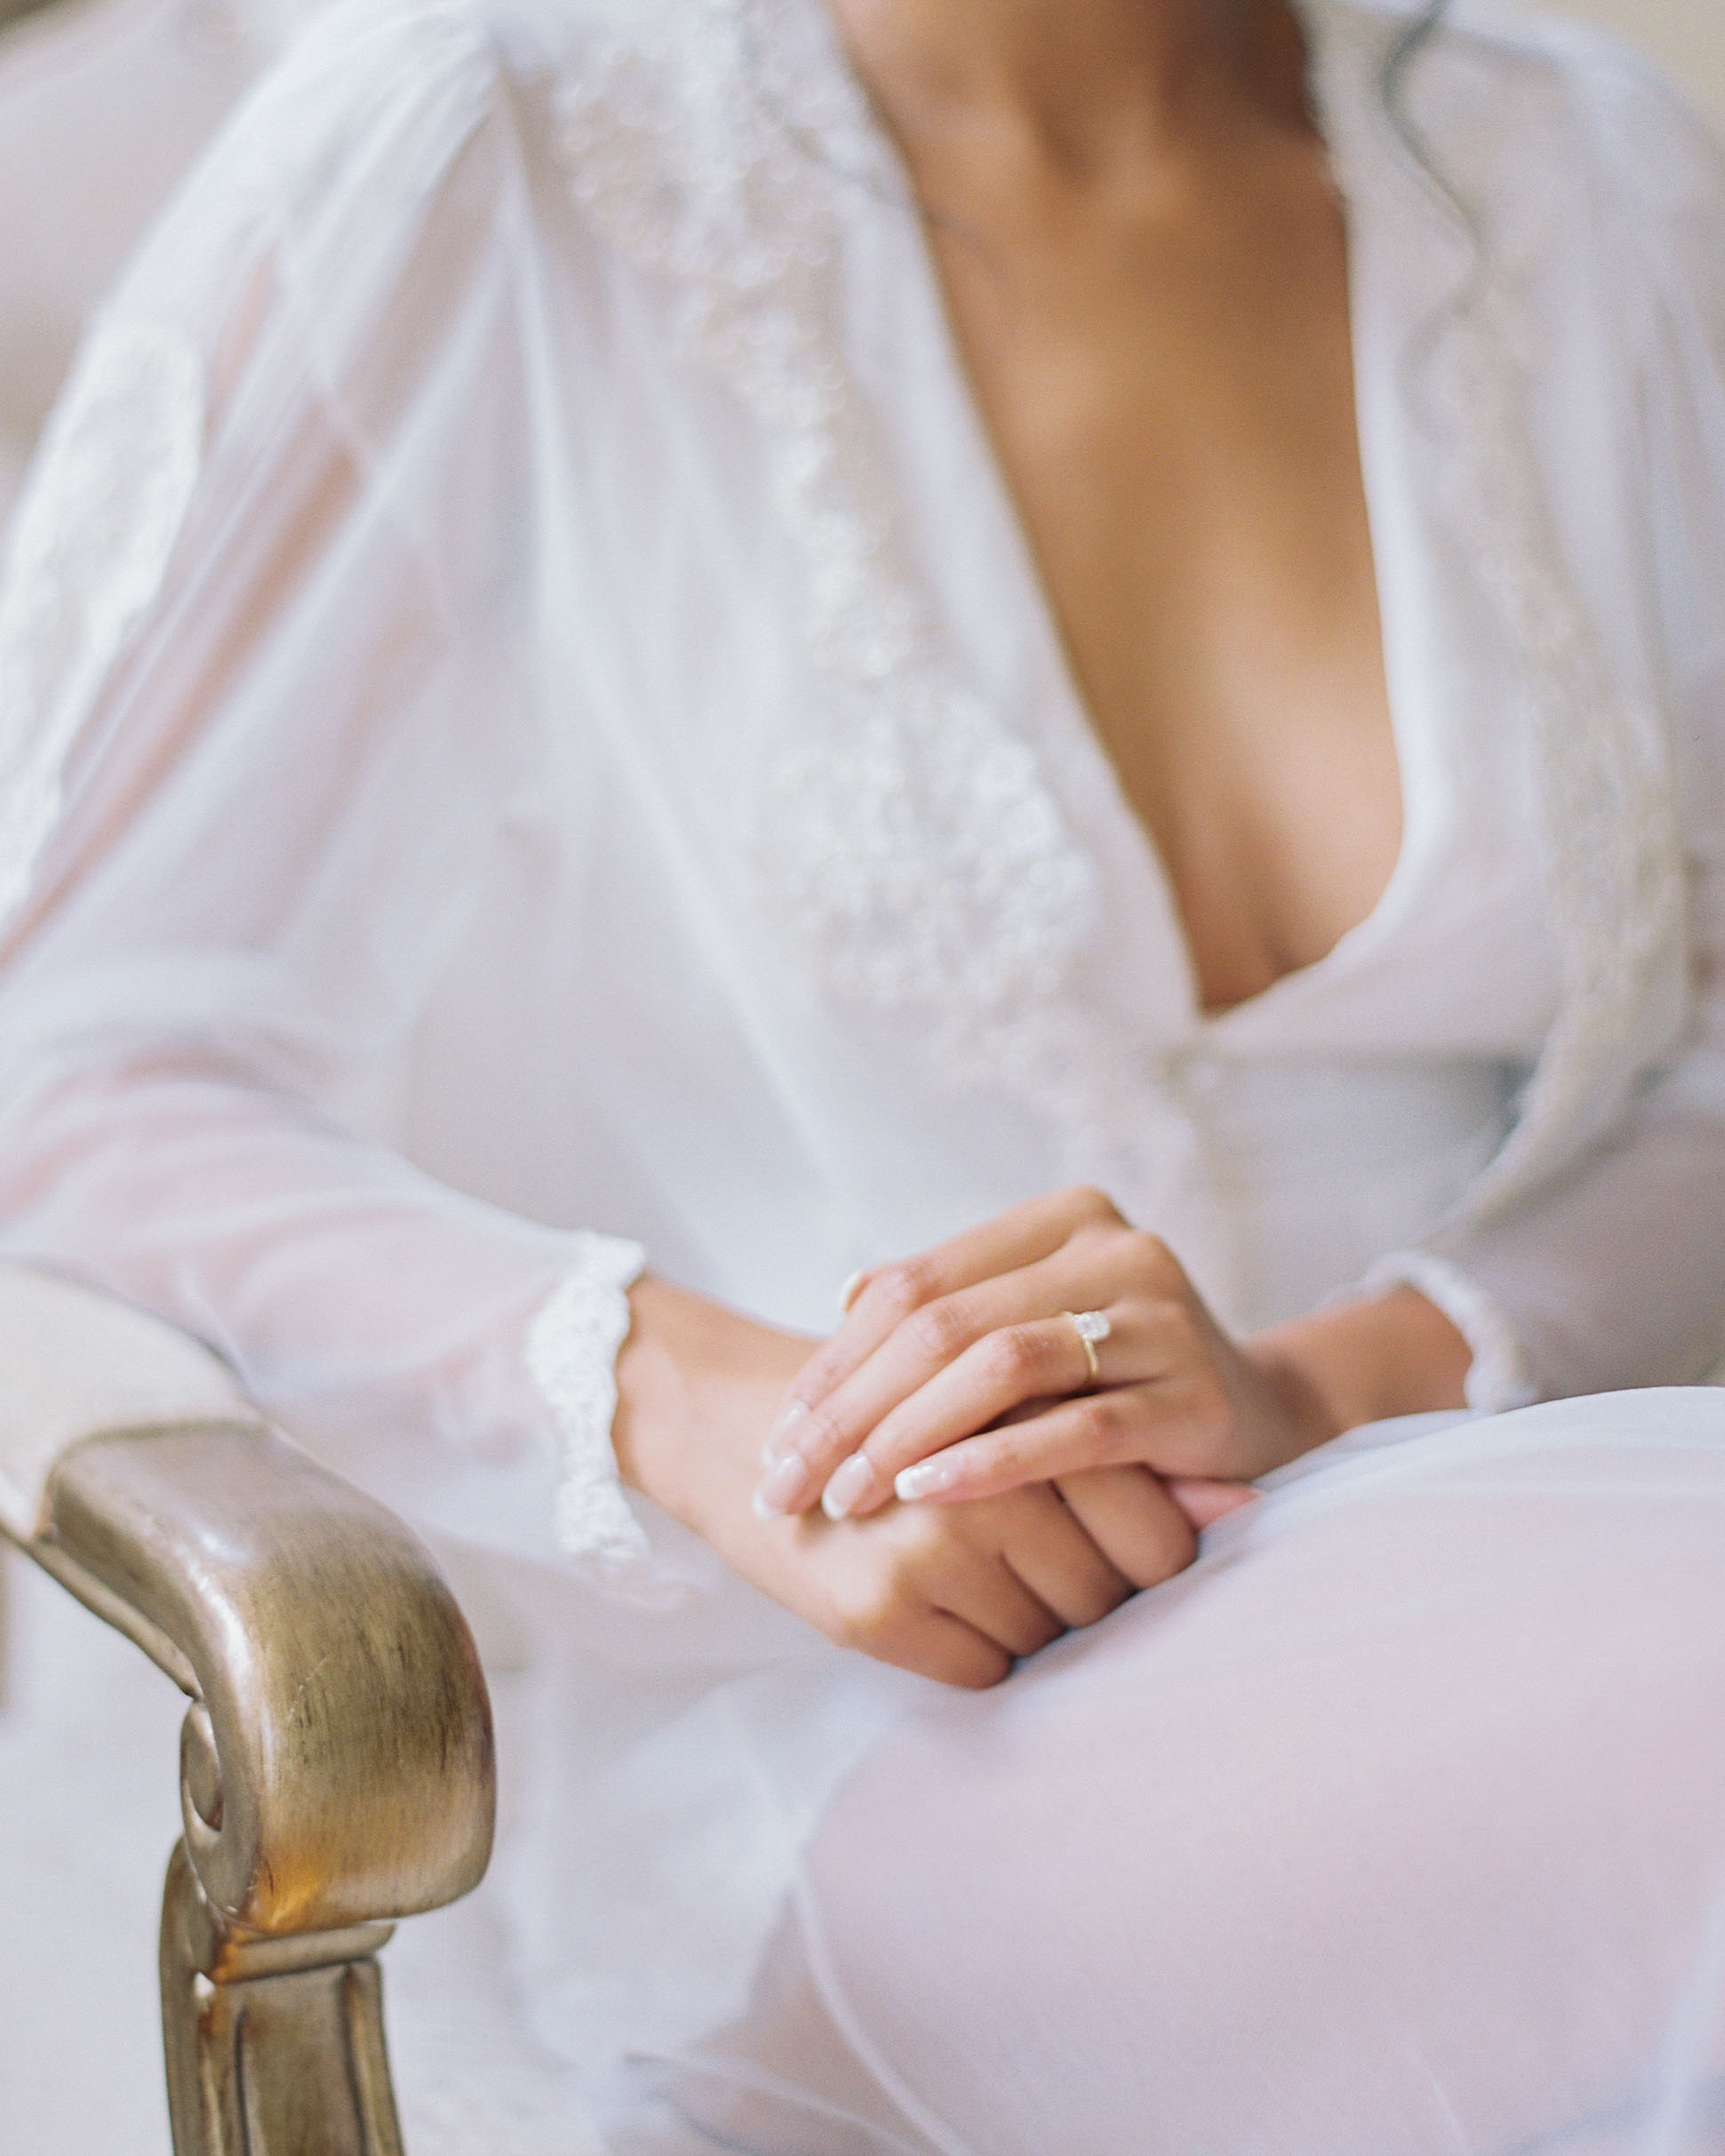 macey joshua bride manicure engagement ring